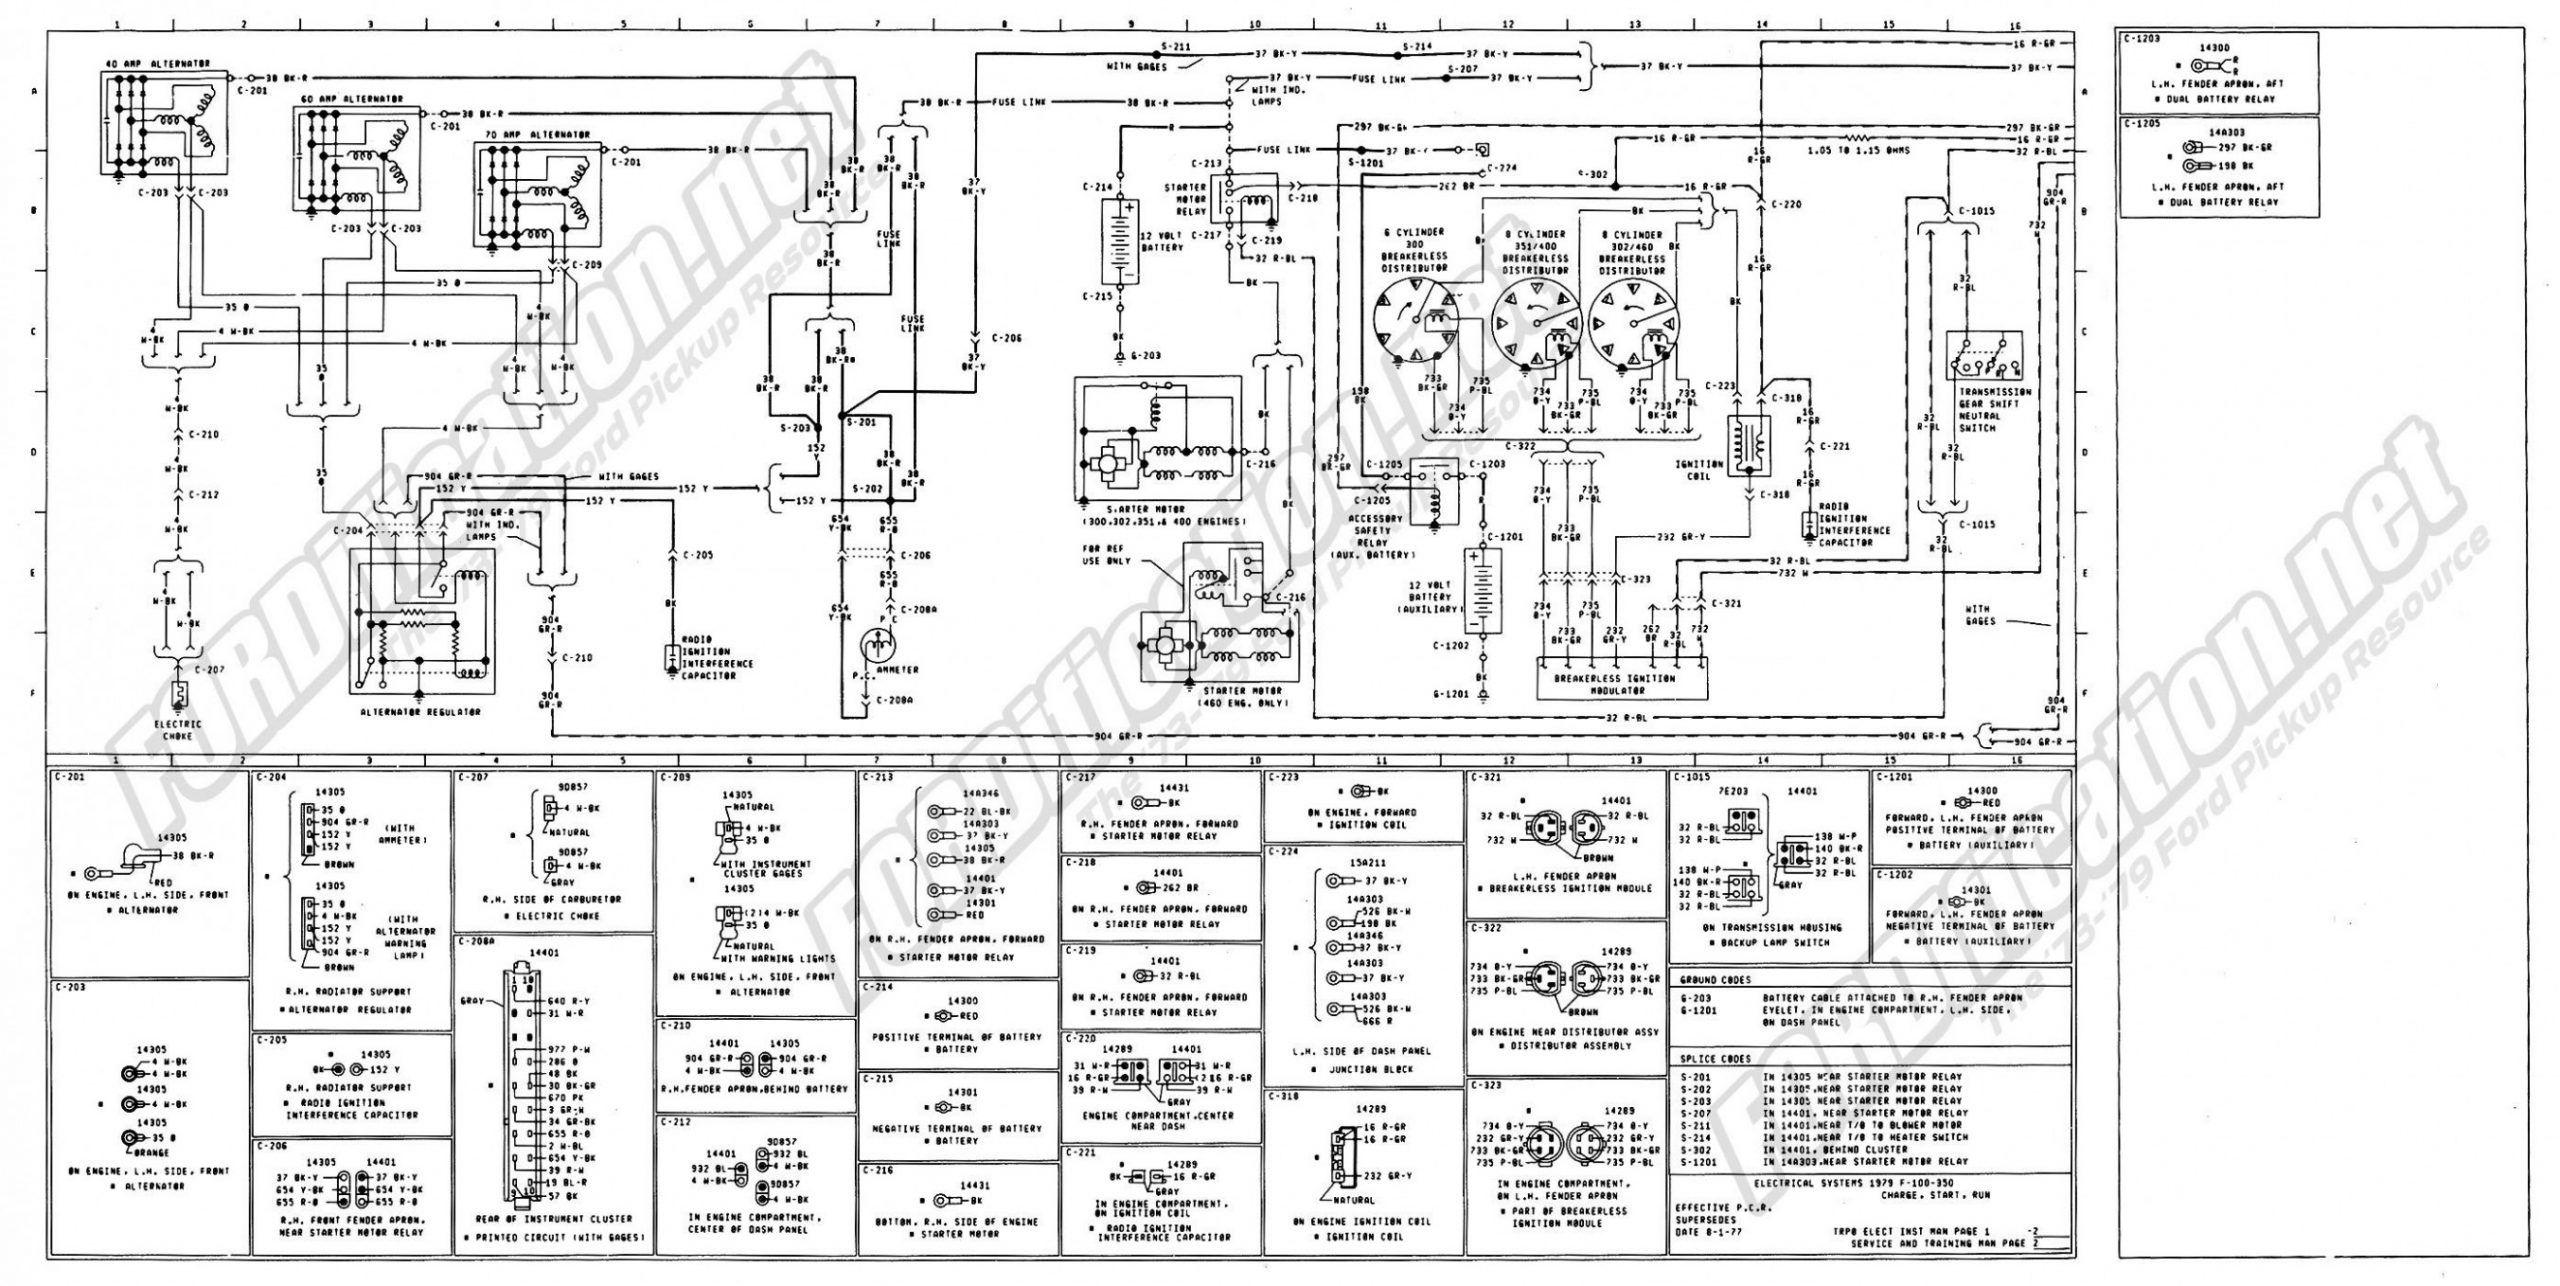 engine wiring diagram for 8 ford ranger black engine wiring diagram for 8 ford ranger black